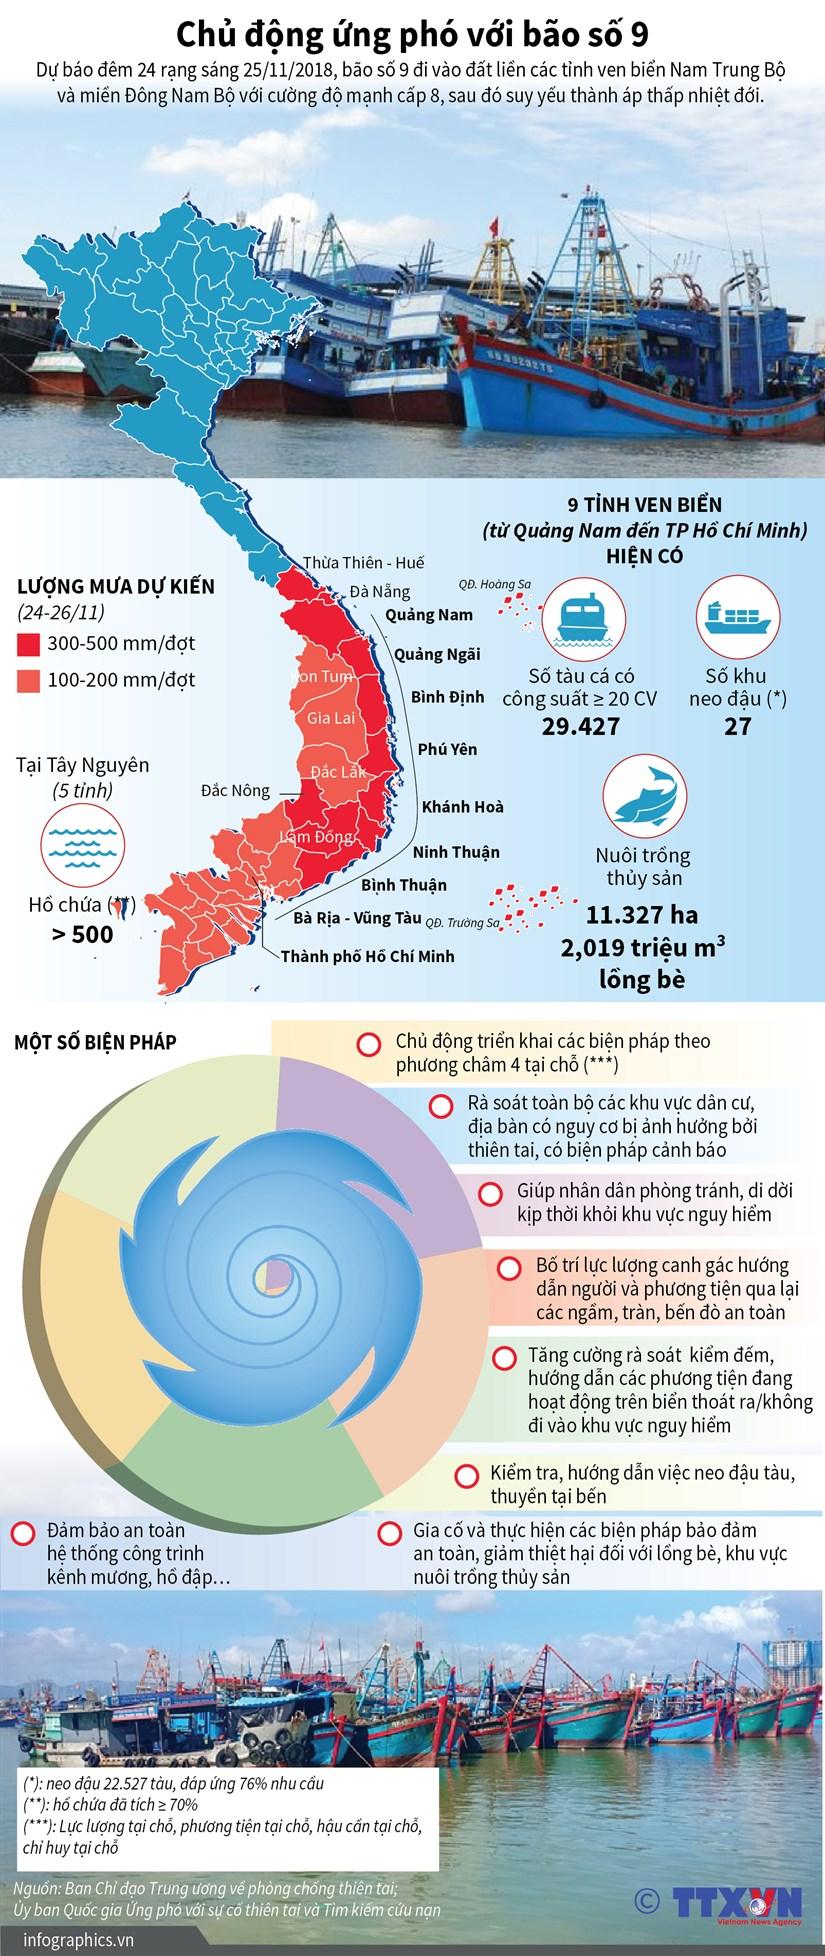 [Infographics] Cac dia phuong ung pho voi bao so 9 nhu the nao? hinh anh 1